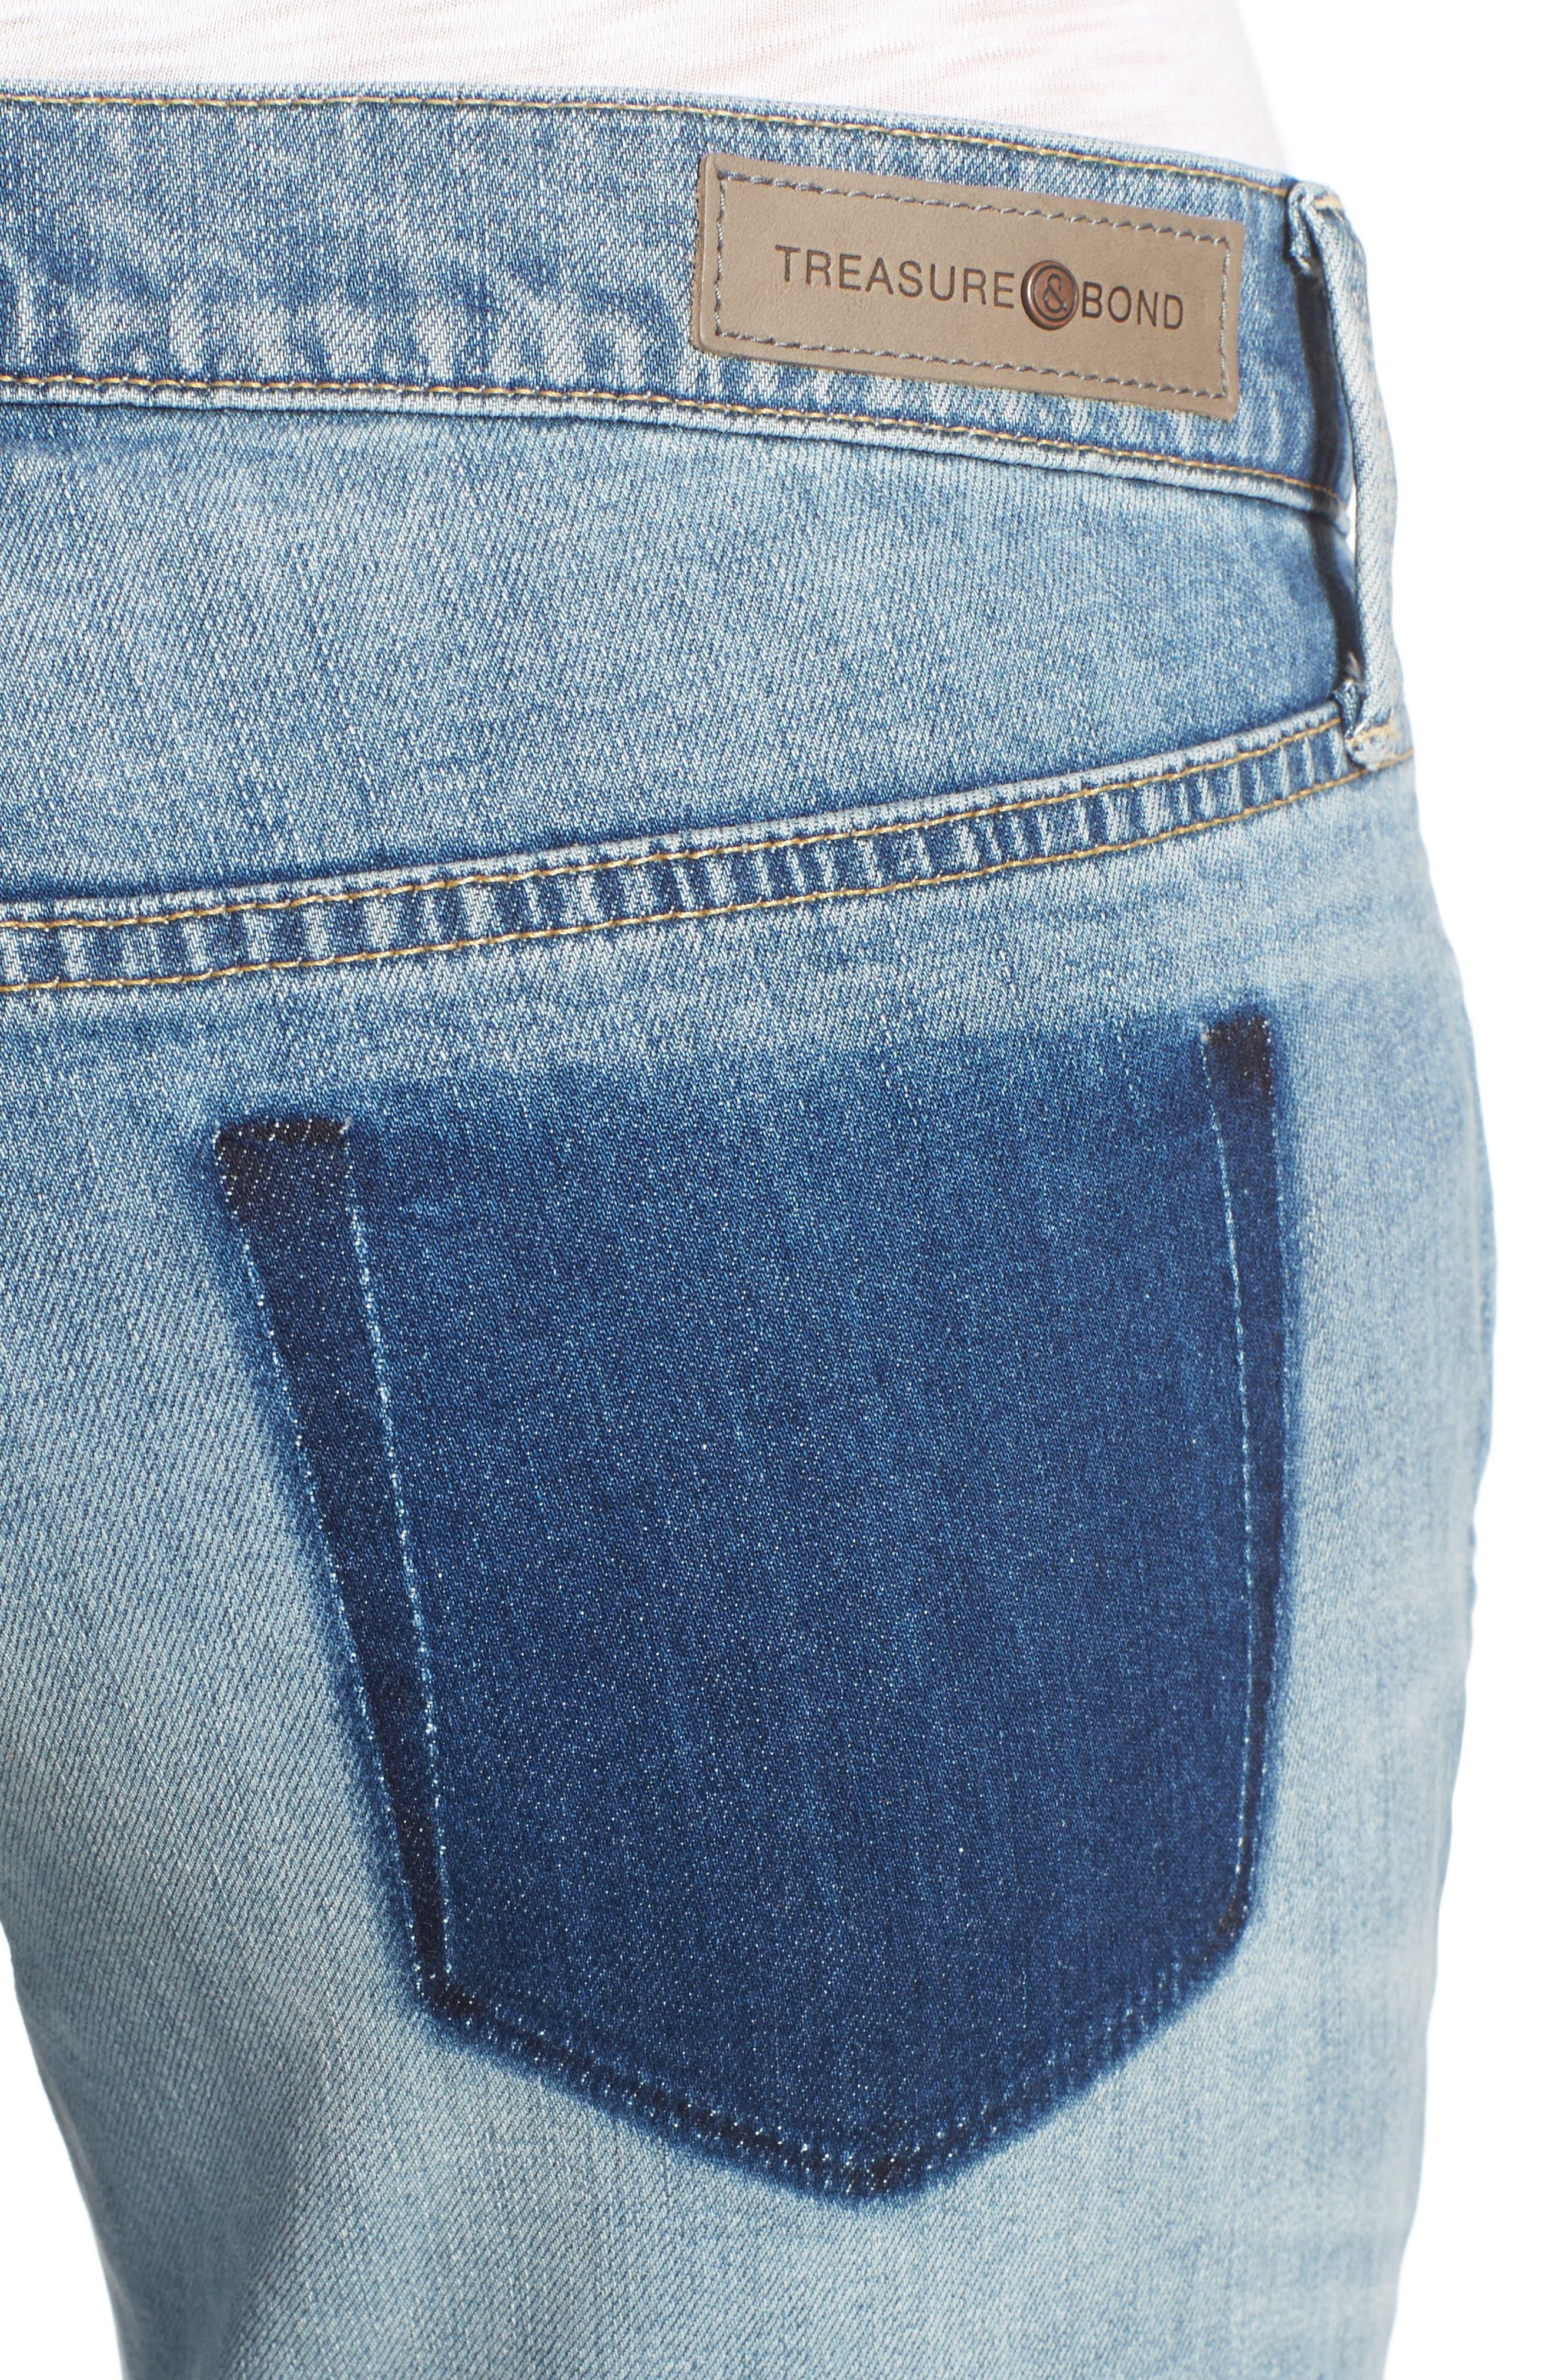 Skinny Boyfriend Jeans,                             Alternate thumbnail 4, color,                             400